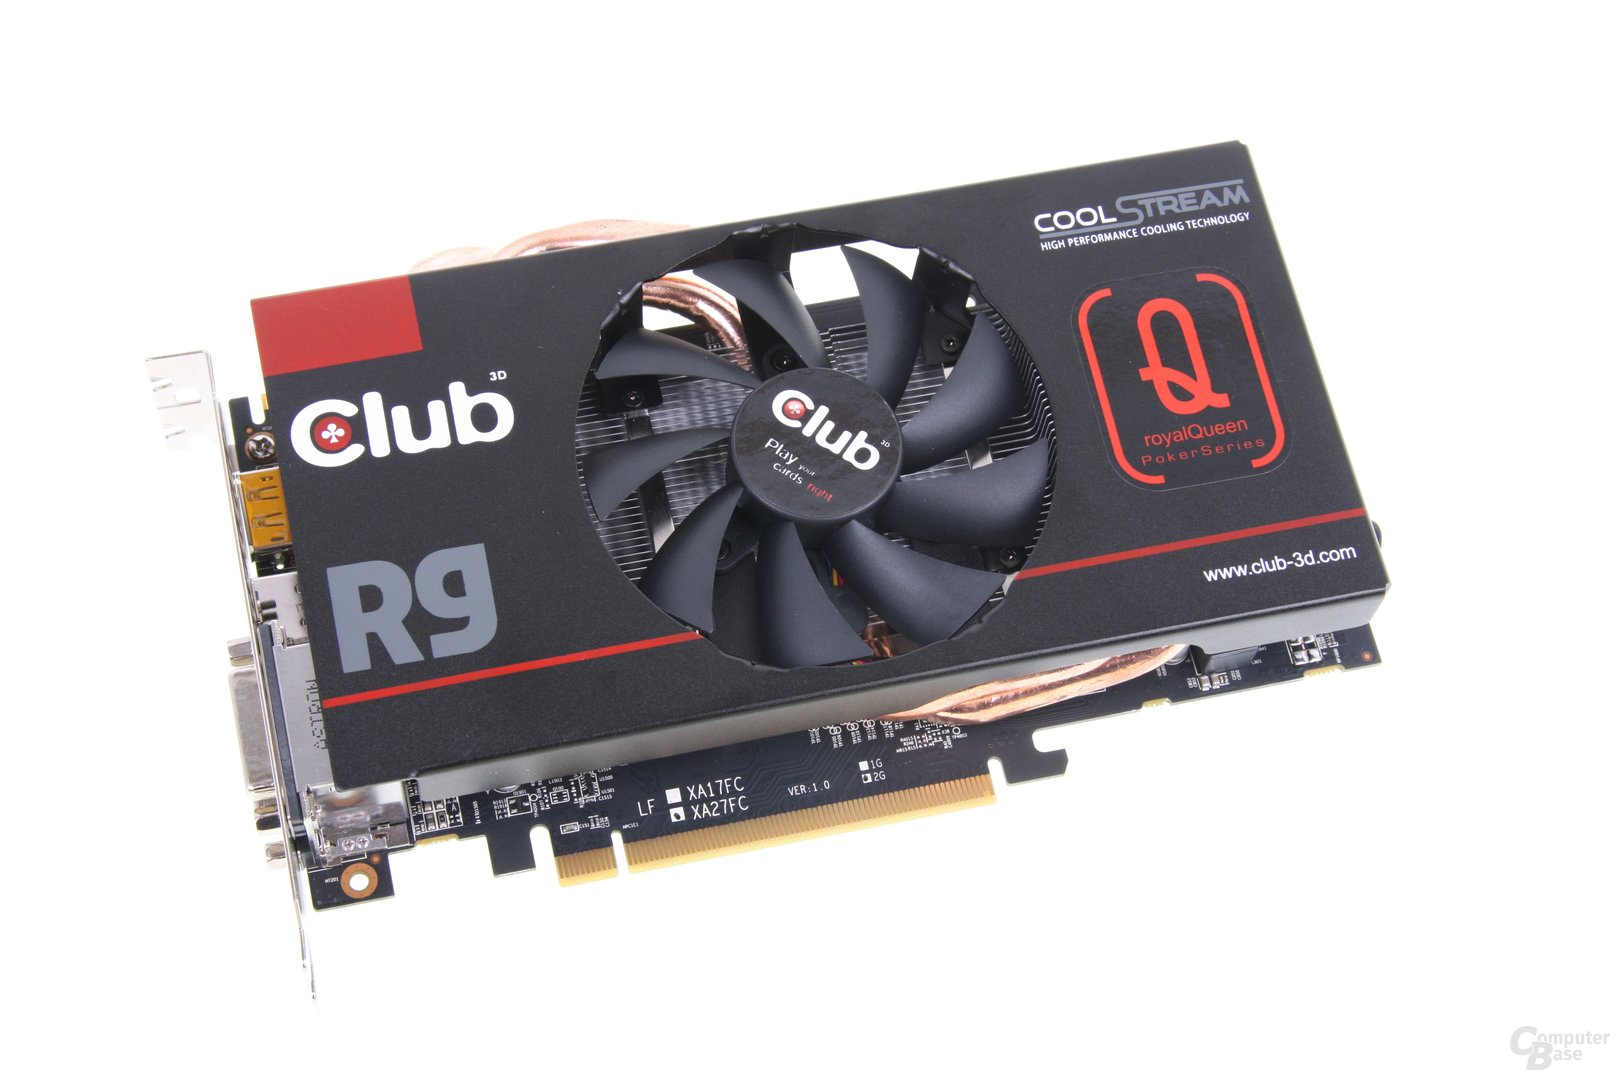 Club3D Radeon R9 270X royalQueen